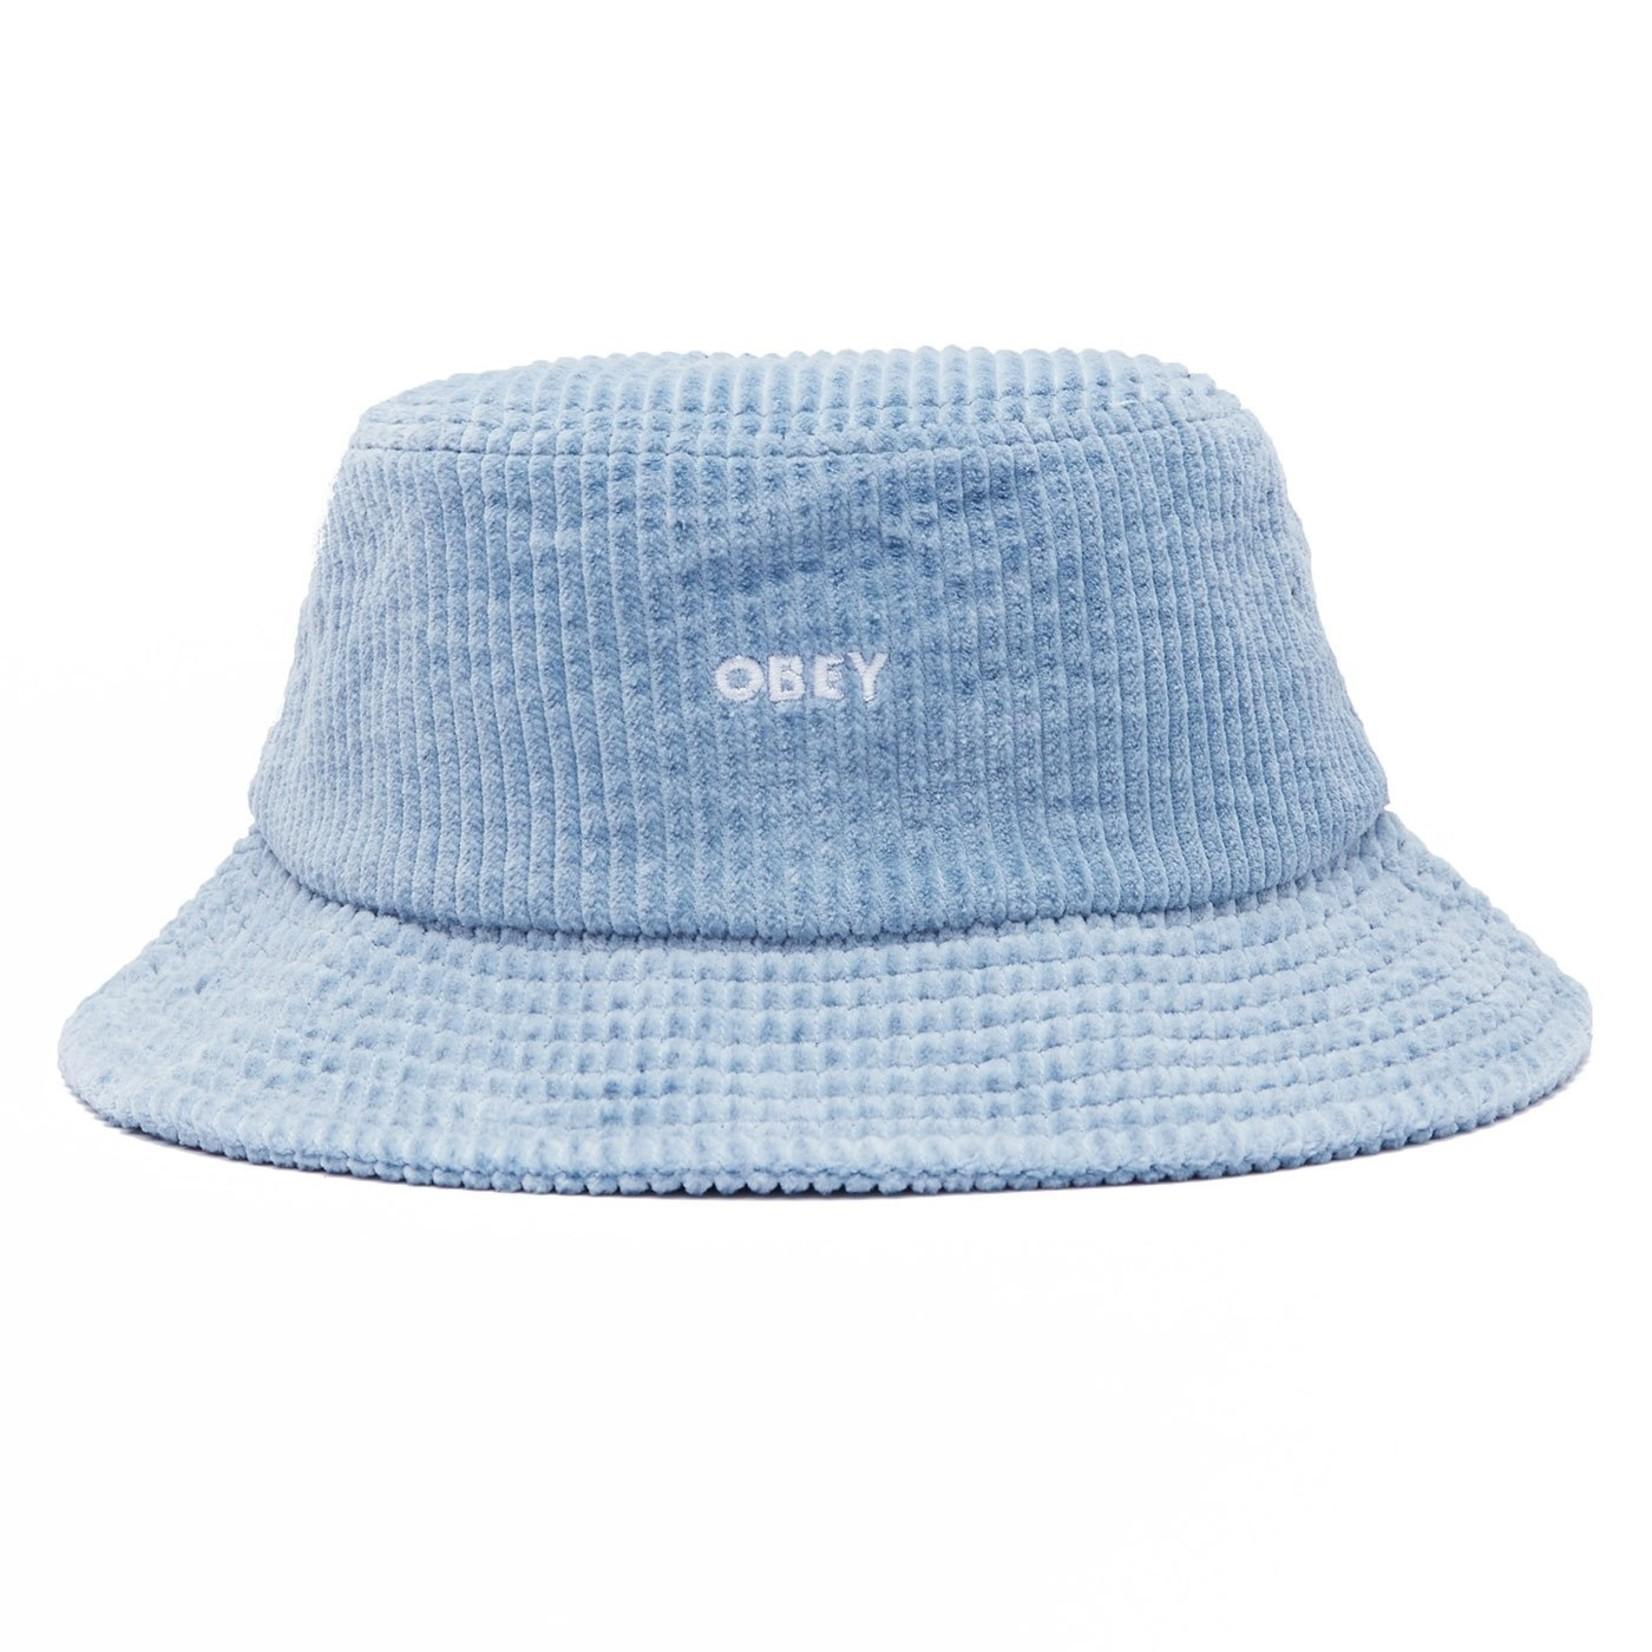 Obey Obey Bold Cord Bucket Hat